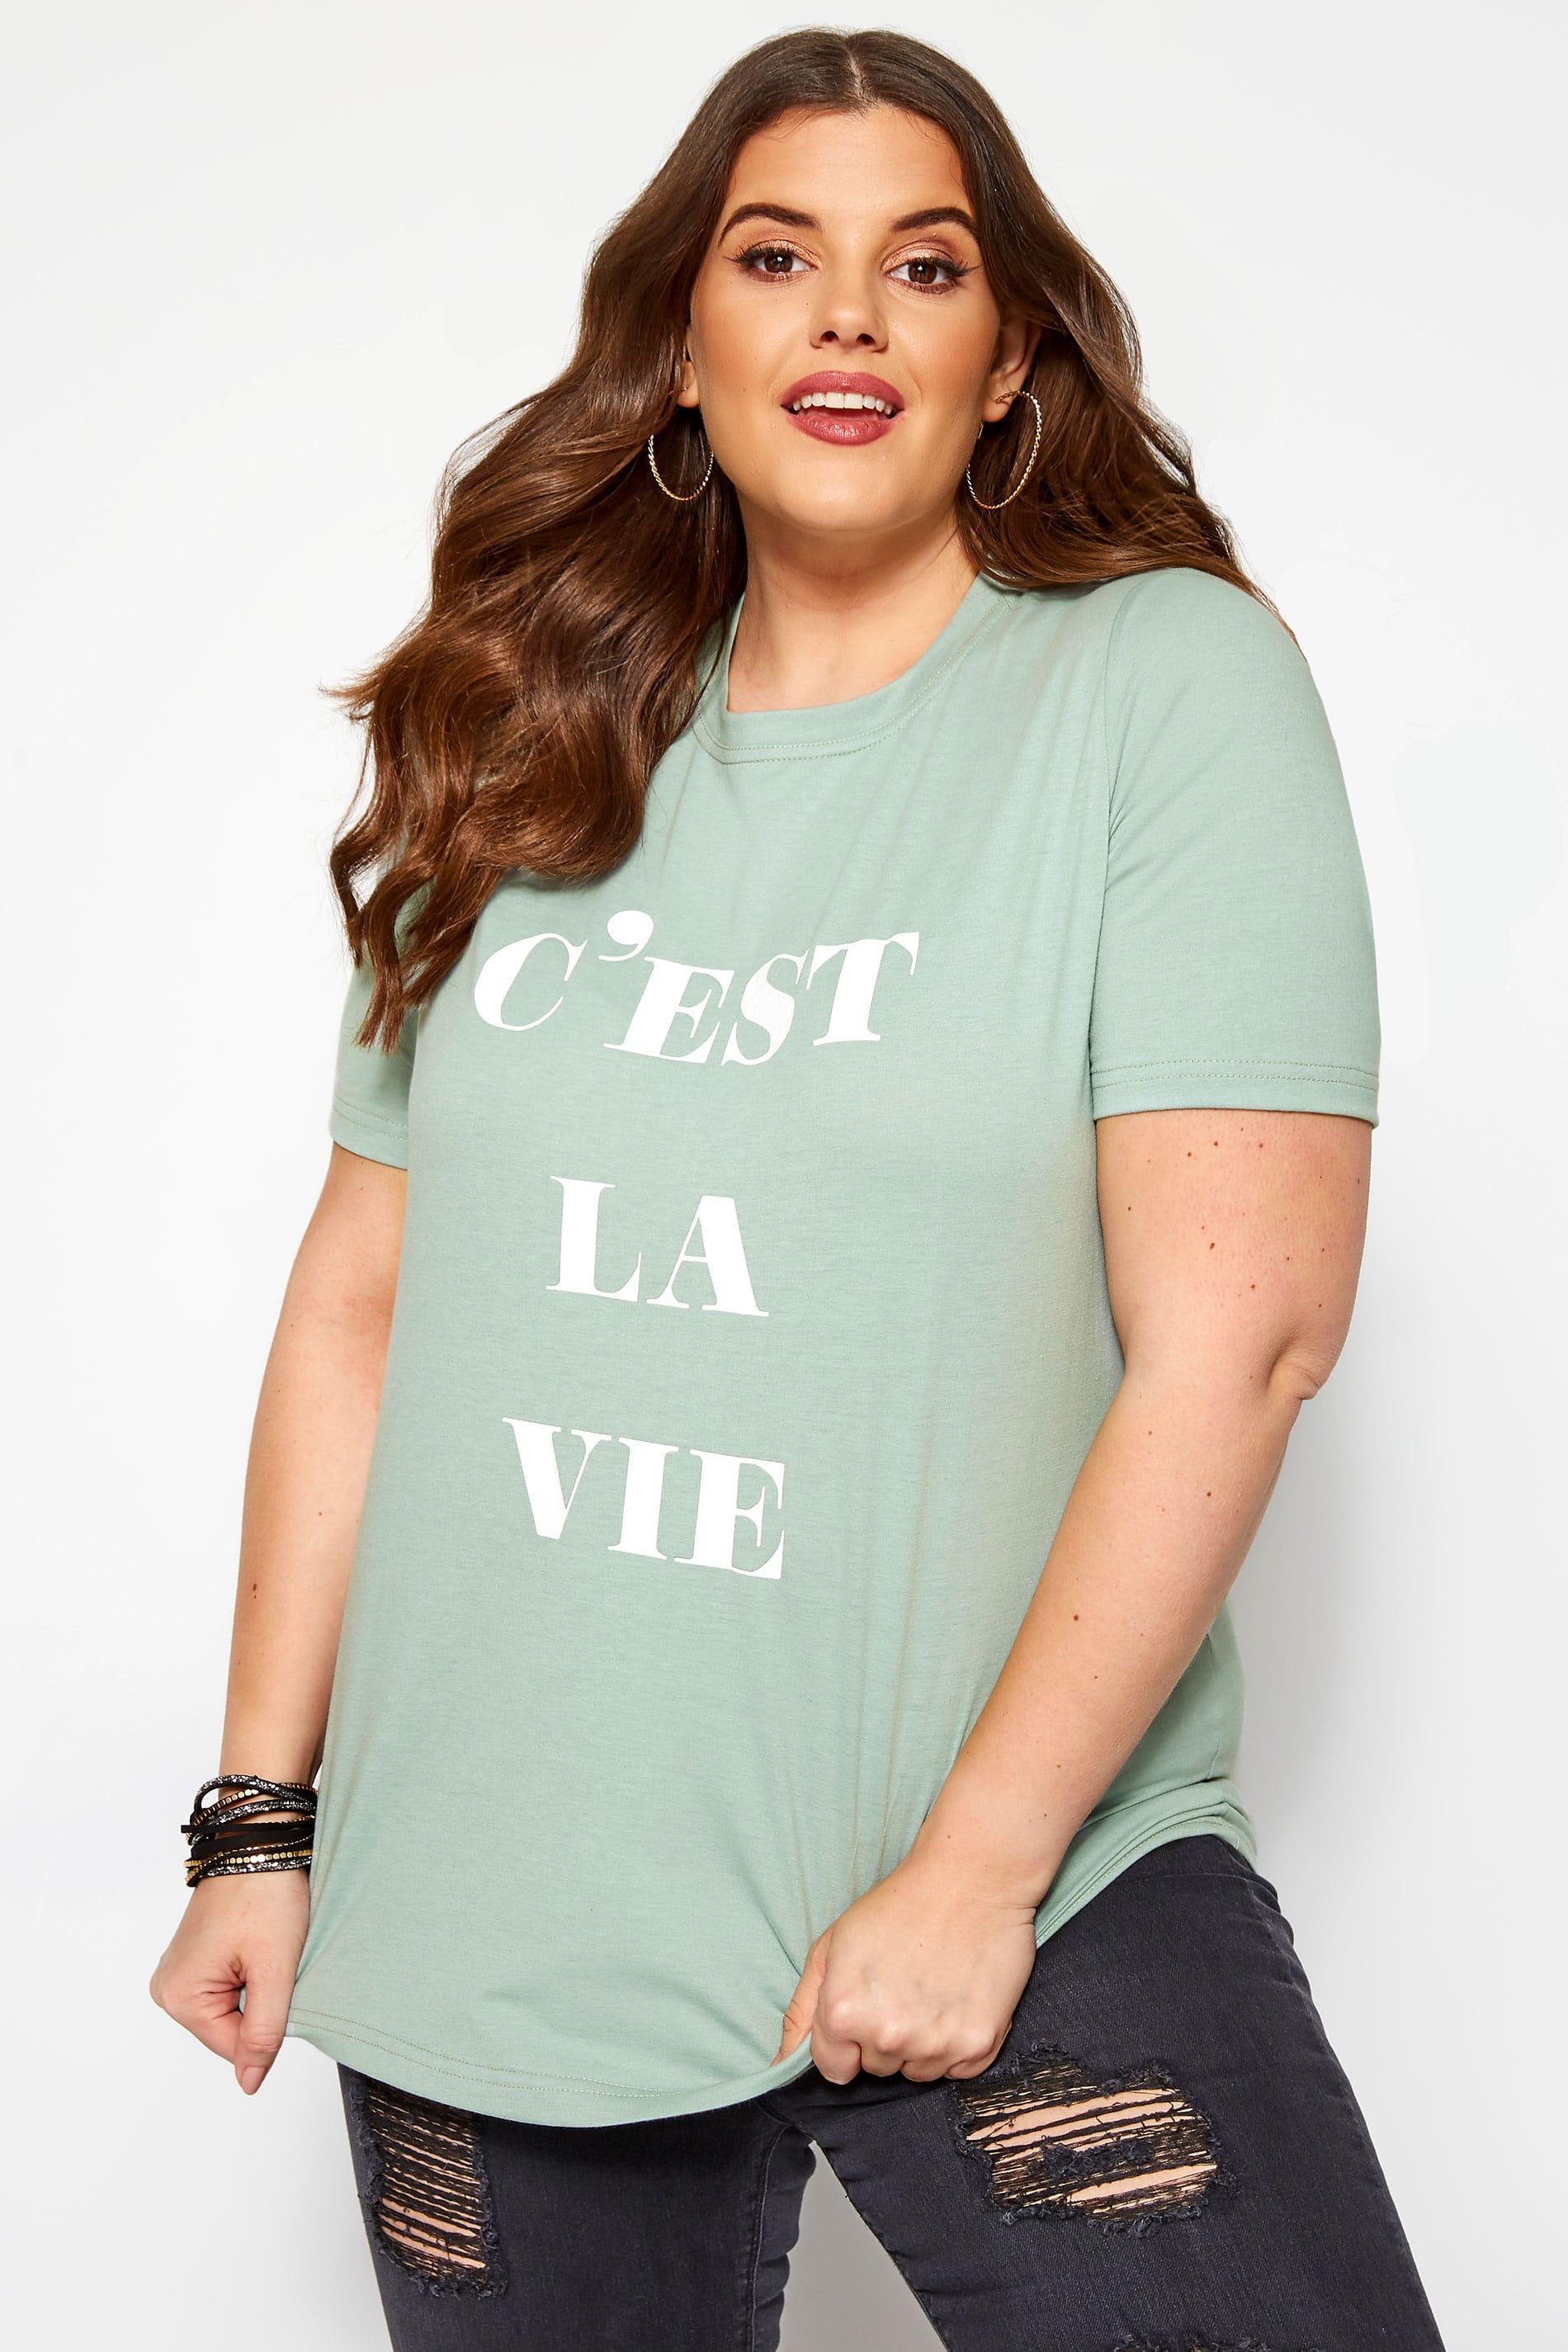 KOKO Mint Green 'C'est La Vie' T-Shirt